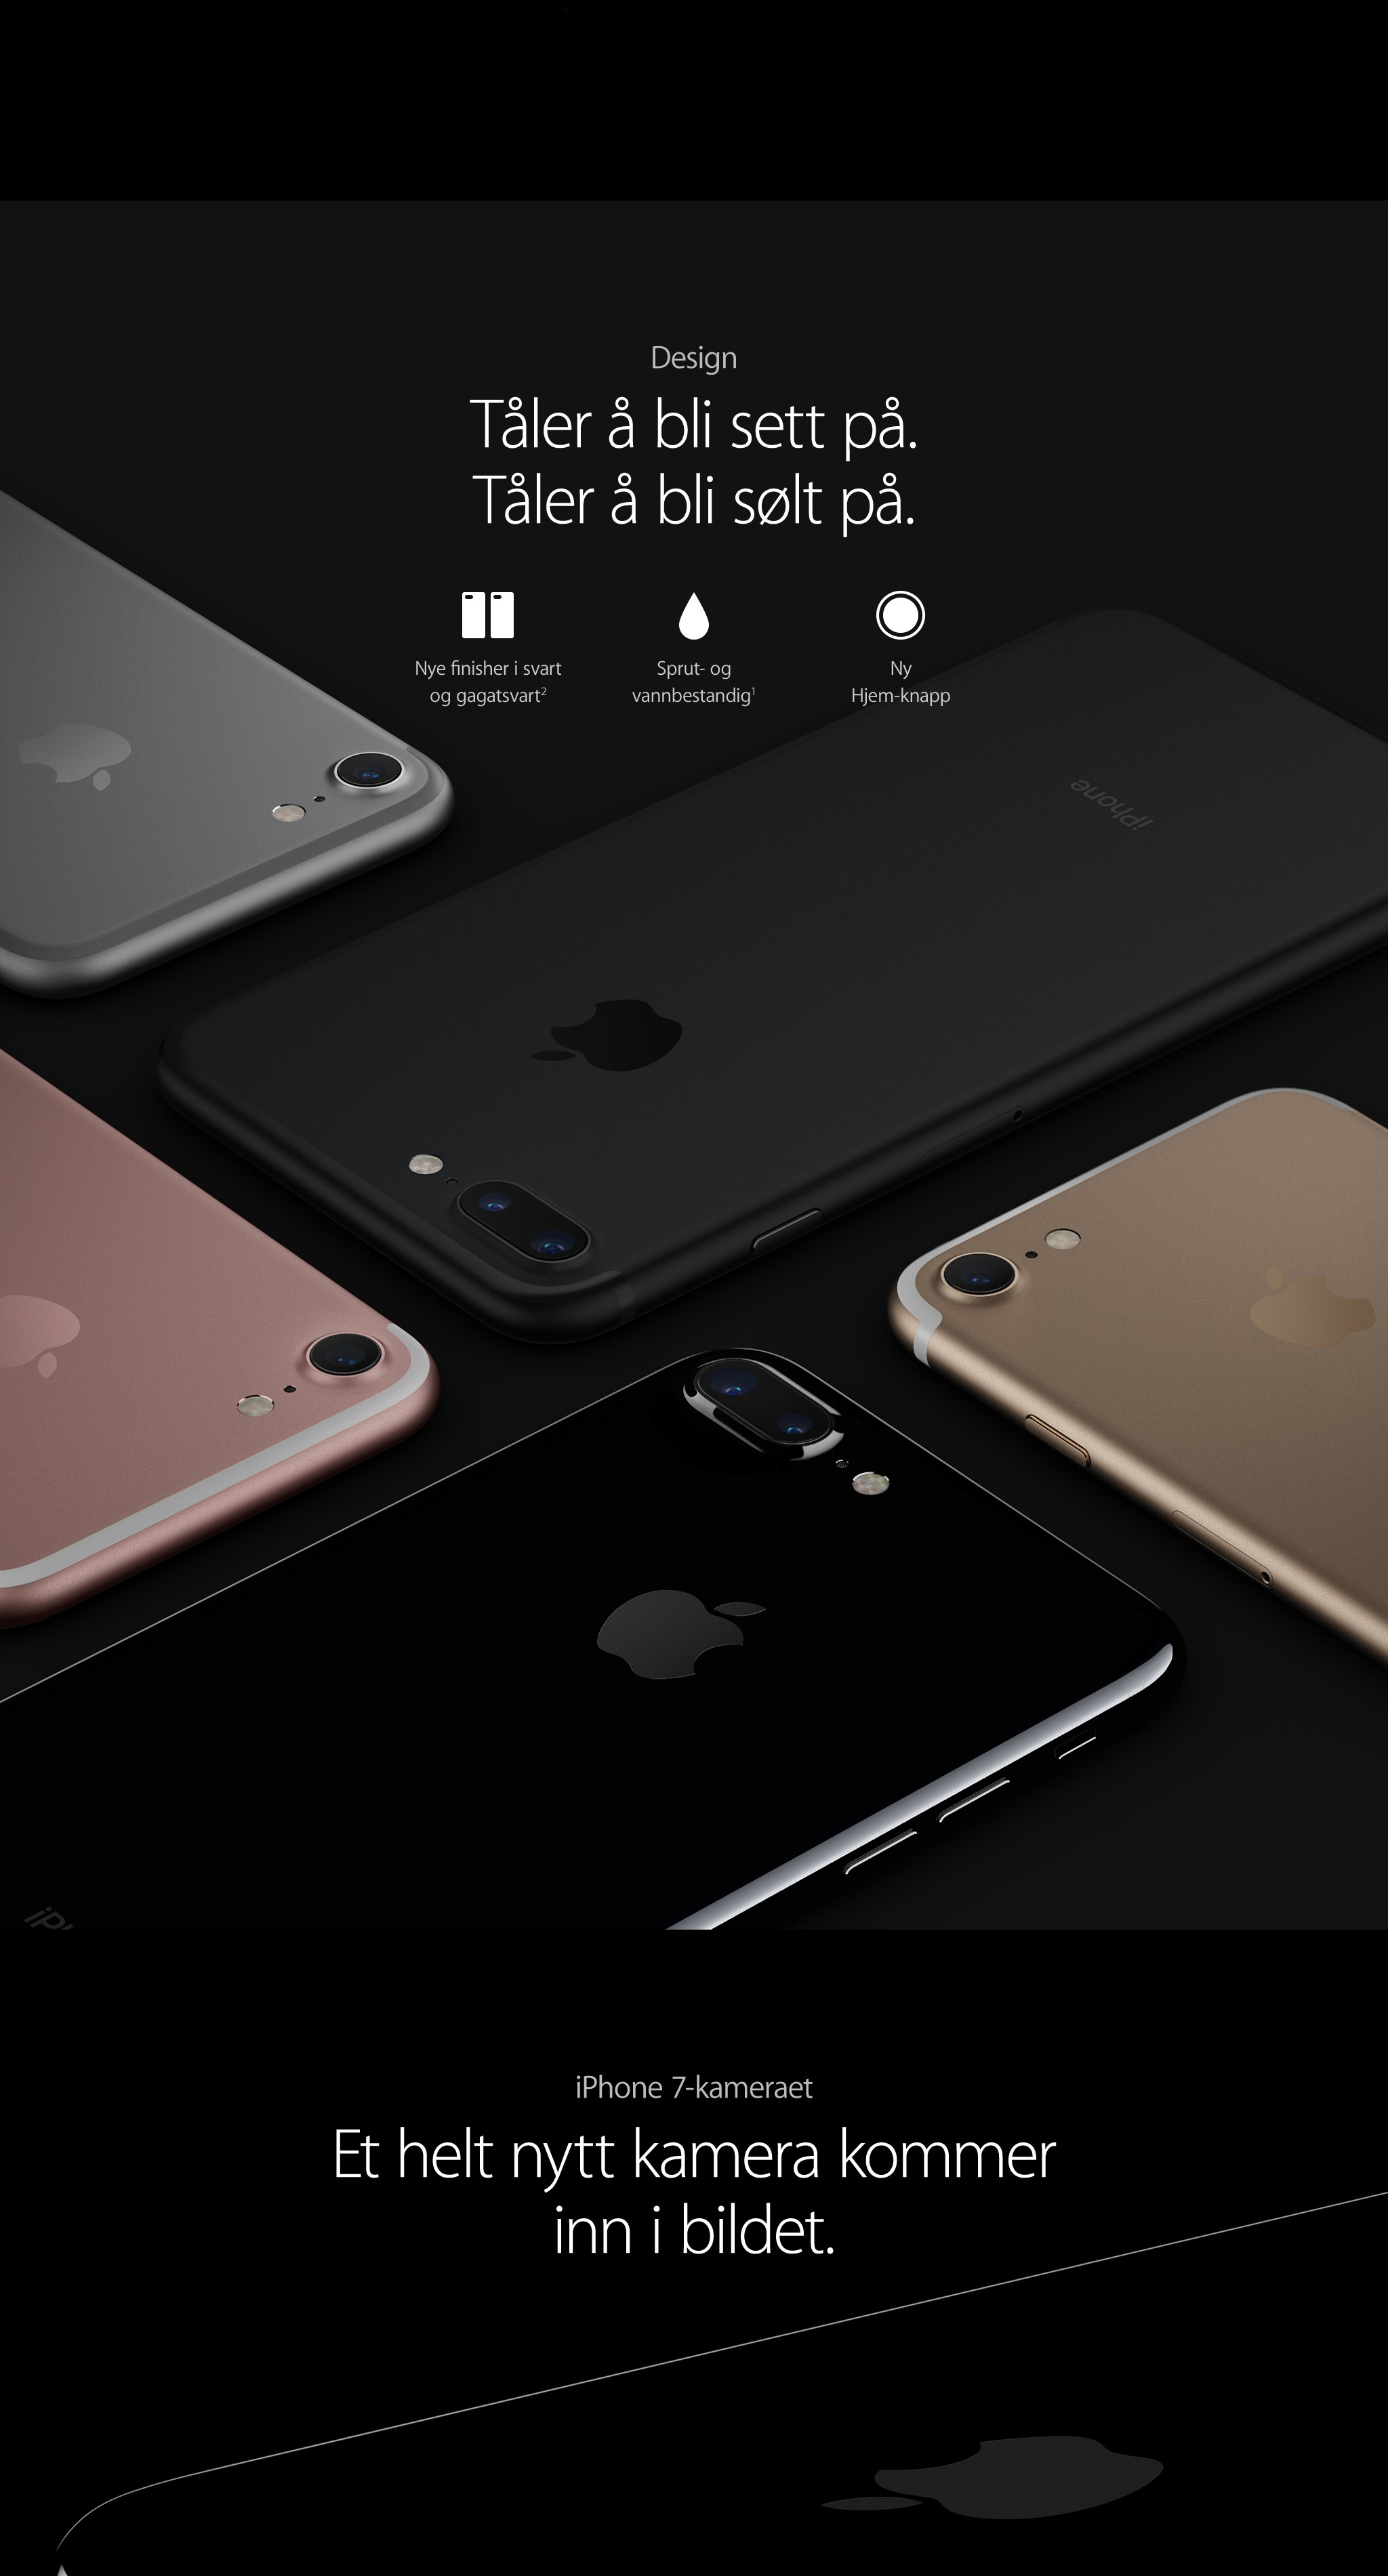 Kjøp iPhone 7 og iPhone 7 Plus hos Elkjøp | Doble kameraer og flere farger